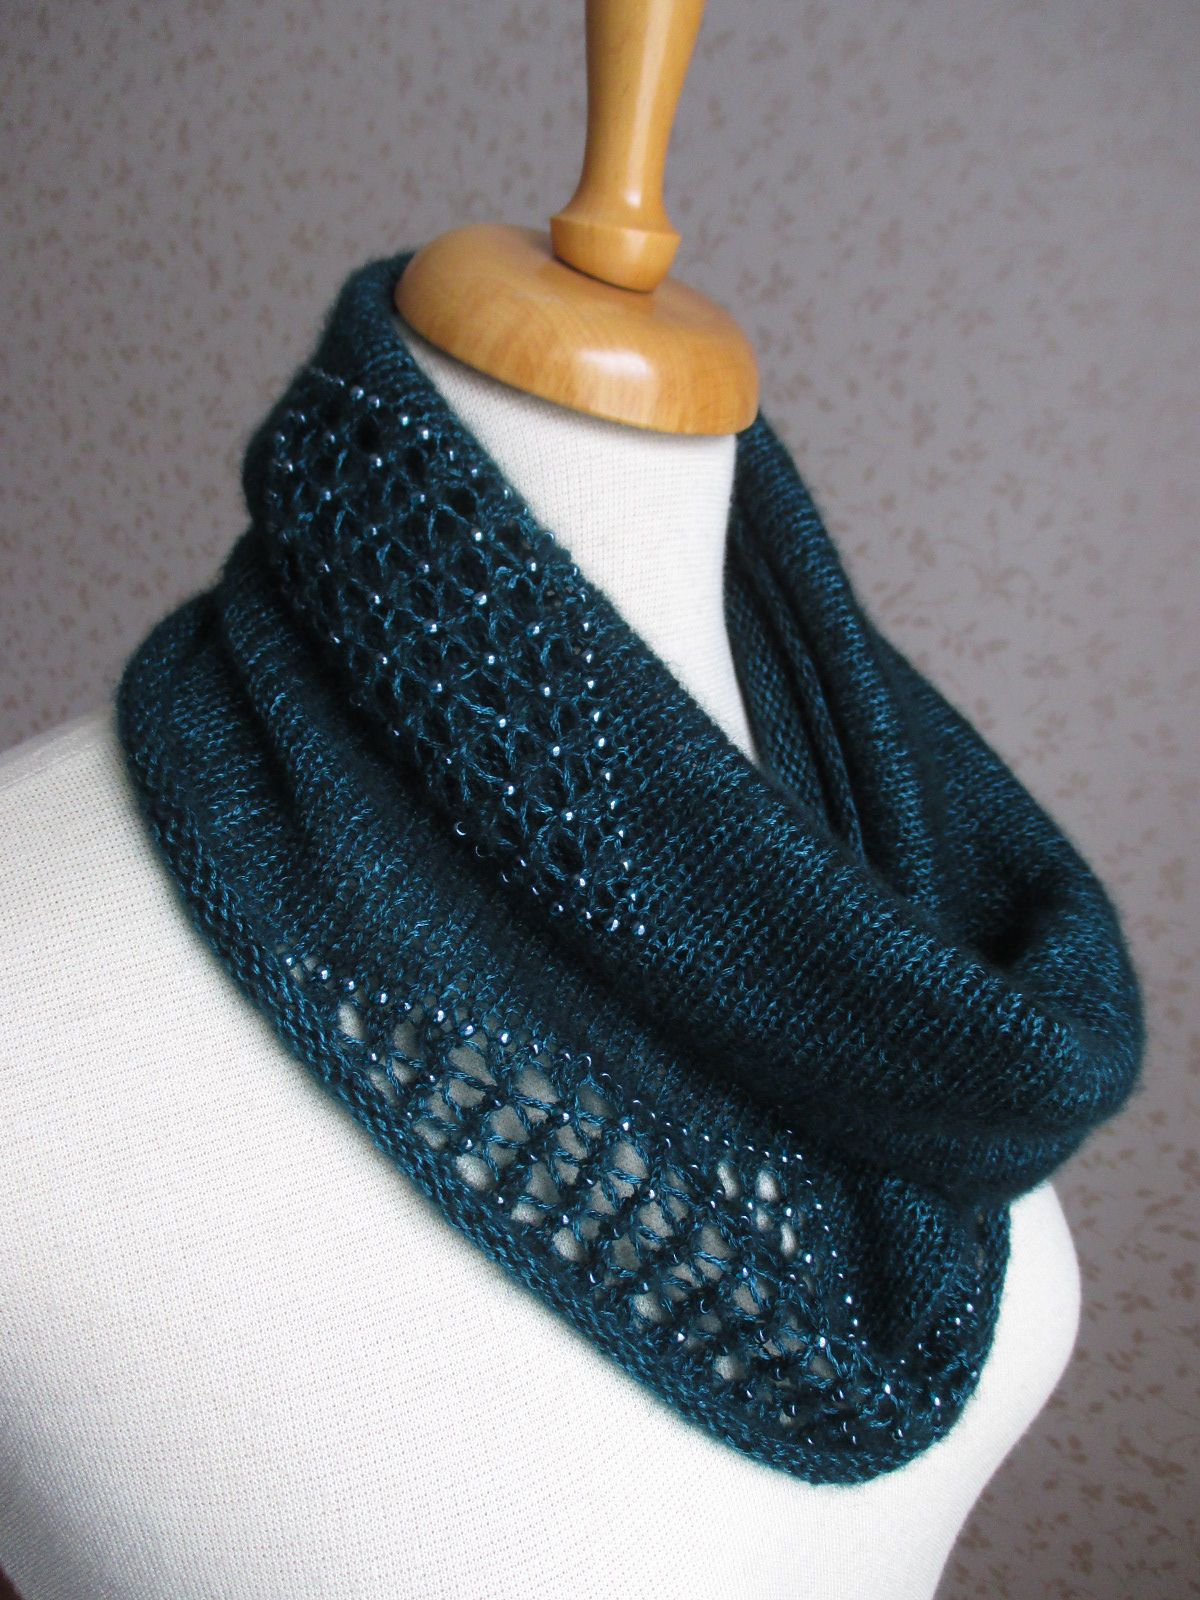 Intermezzo Cowl By Rahymah - Free Knitted Pattern - (ravelry) | Knit ...